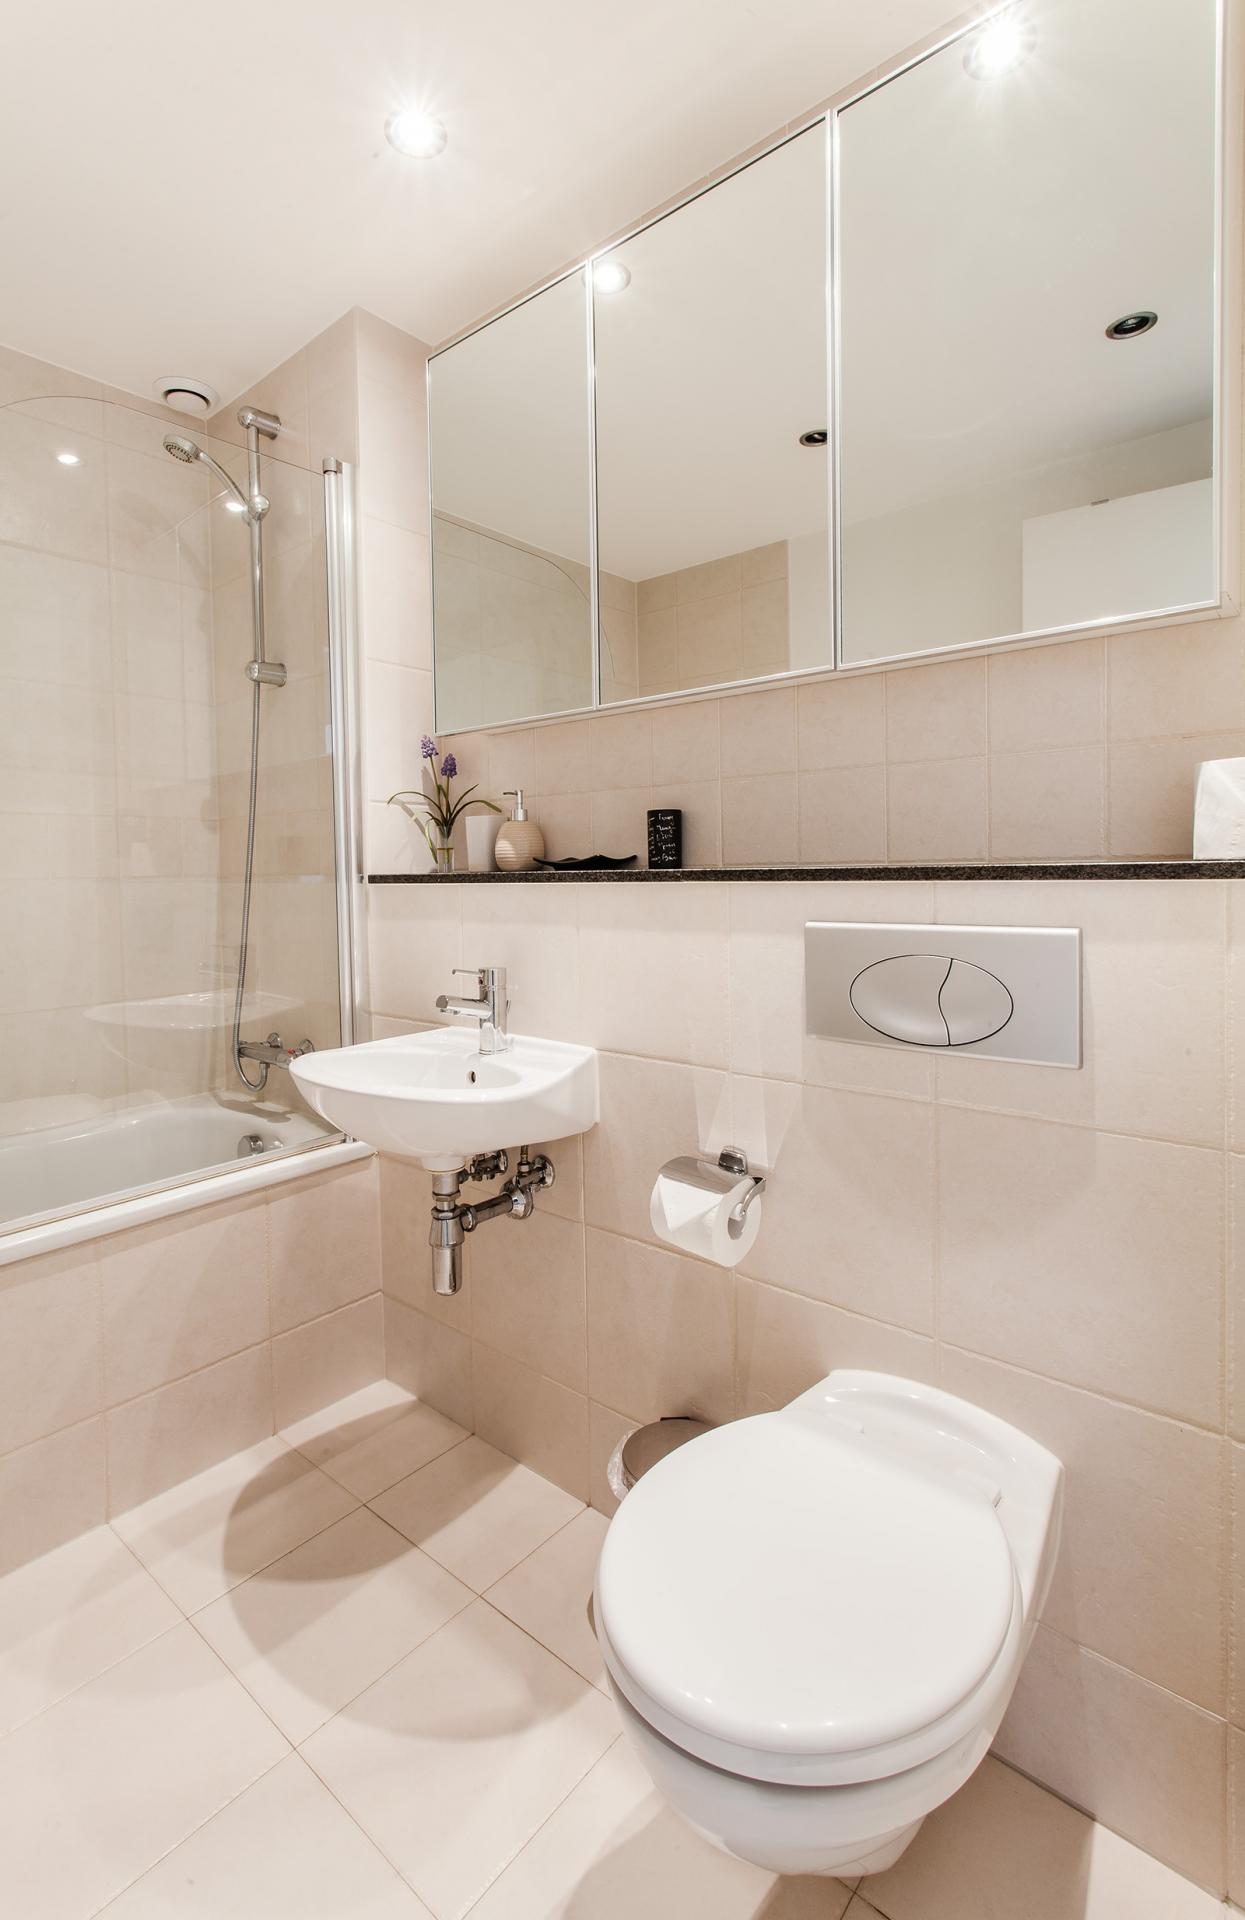 Bathroom at Grand Canal Square Apartment, Centre, Dublin